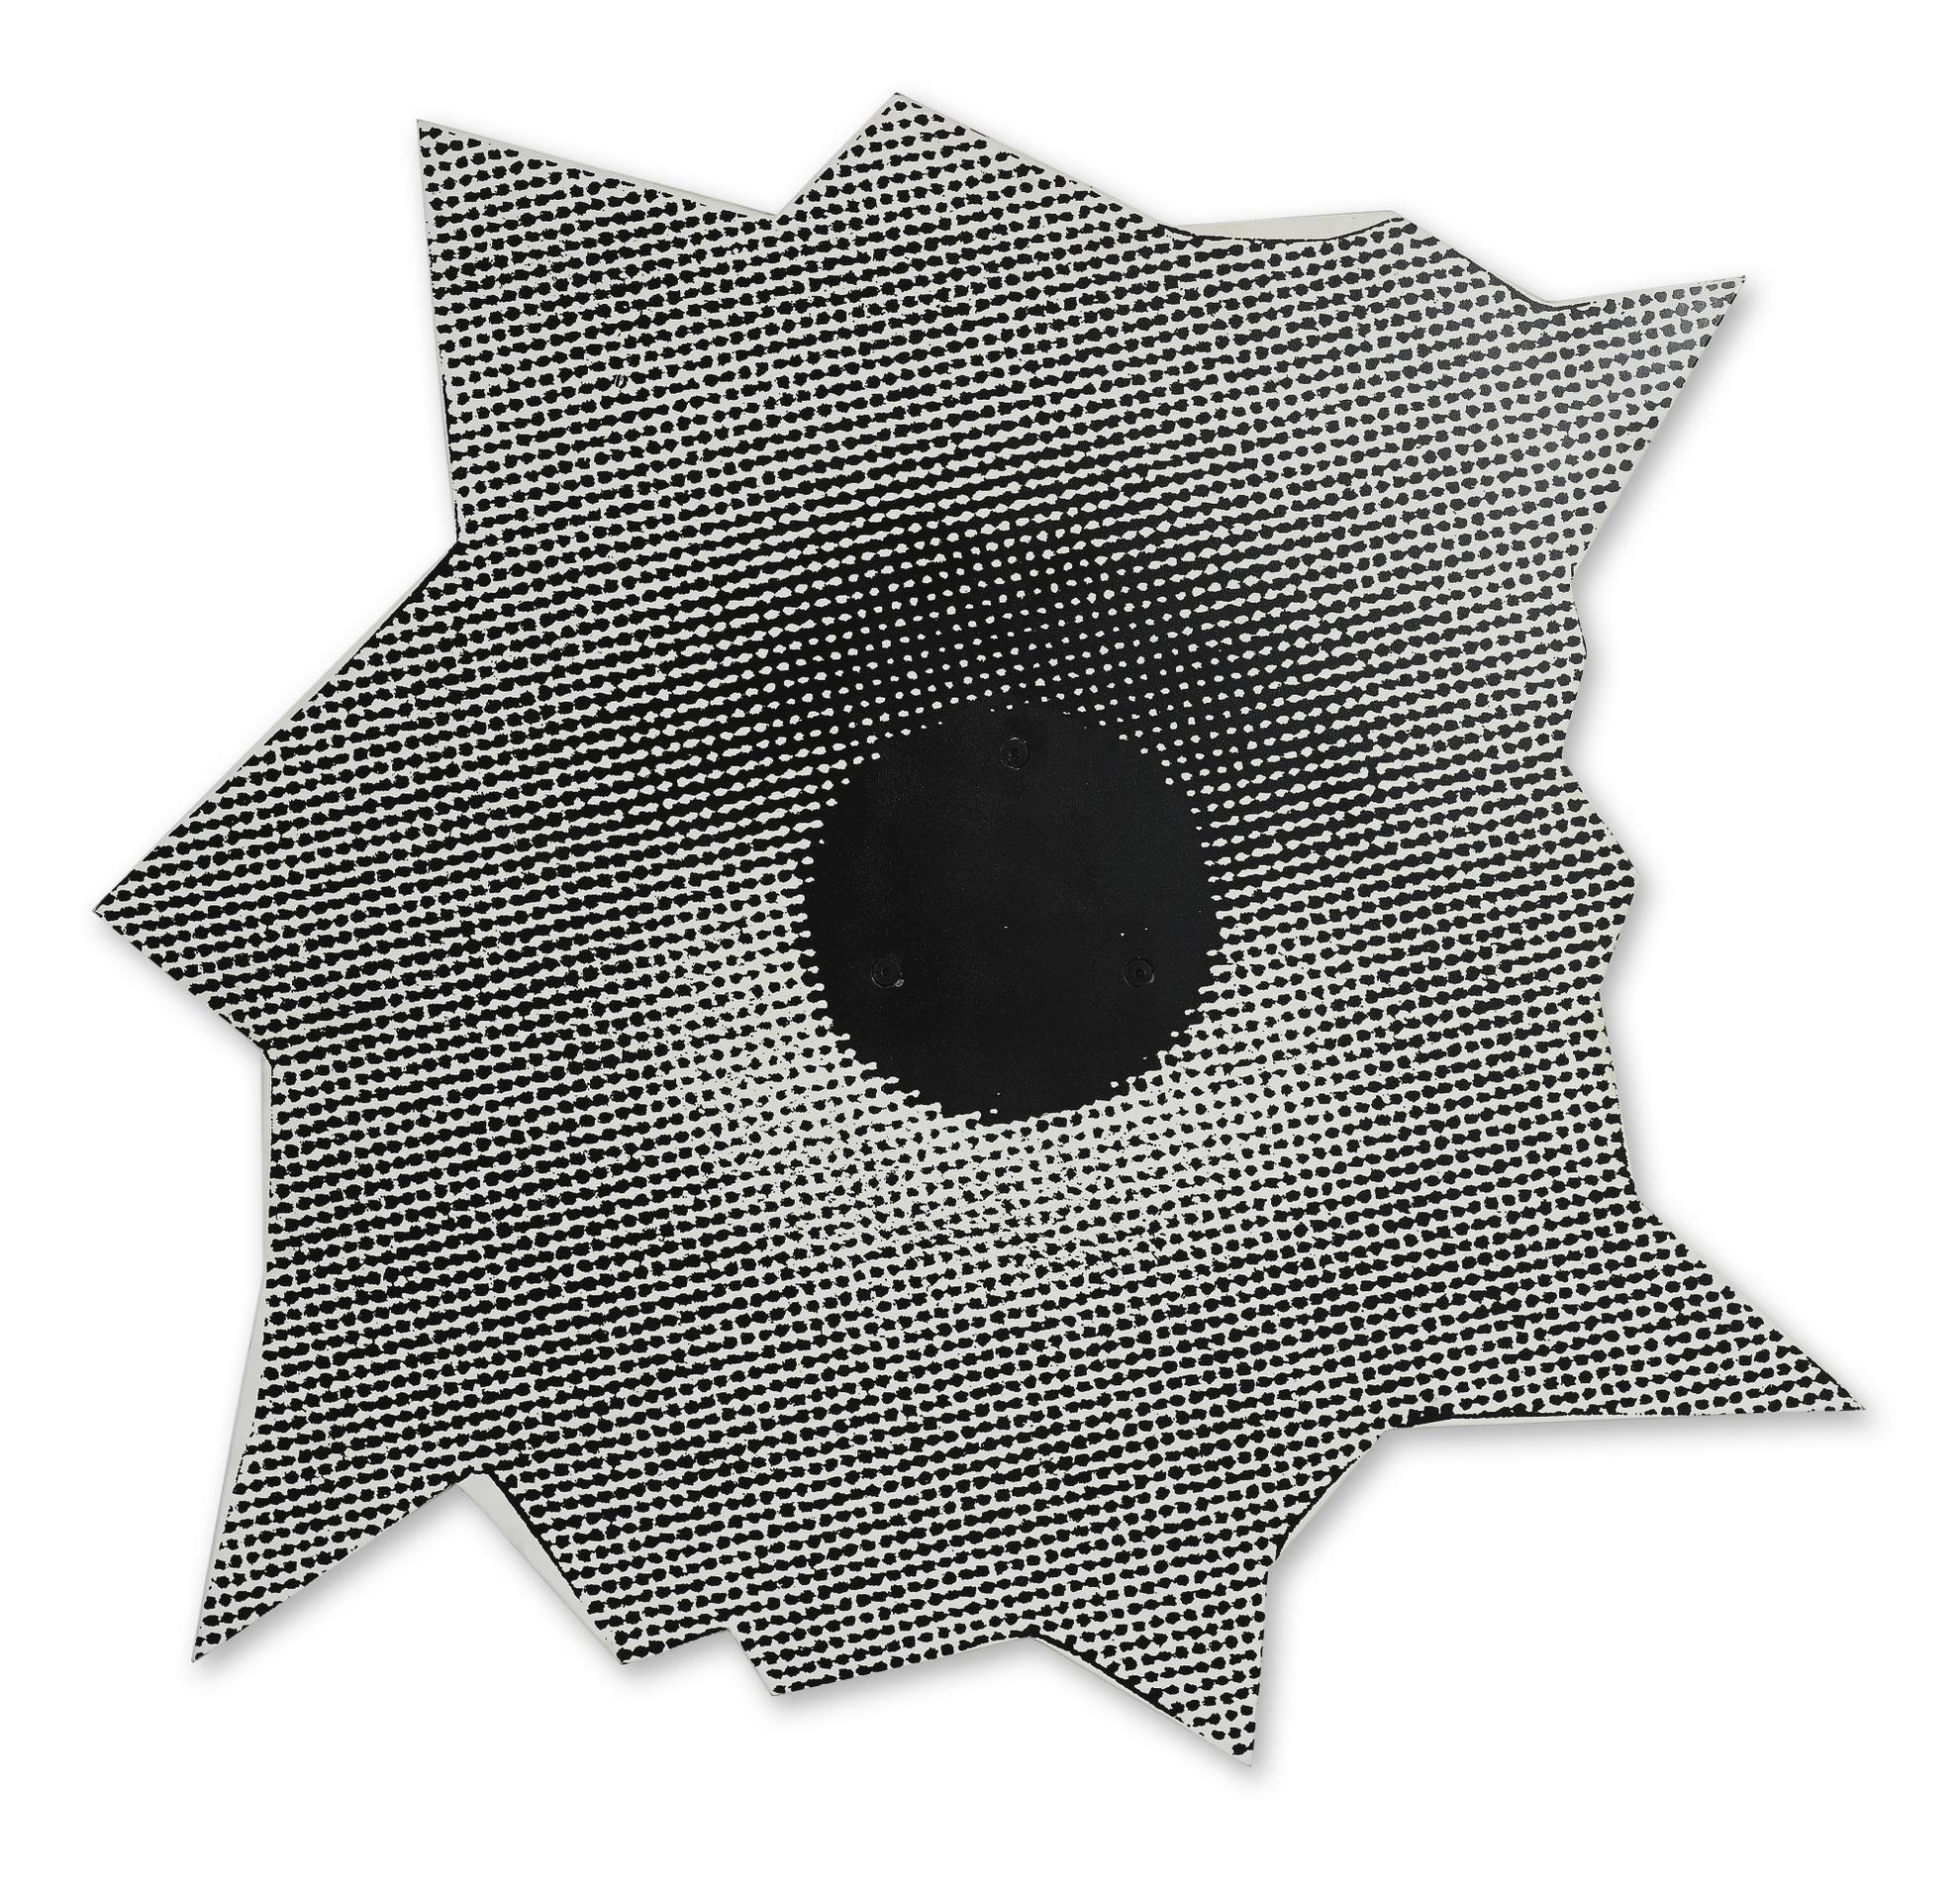 Nate Lowman-Outdoor Sculpture (Bullethole #1)-2005